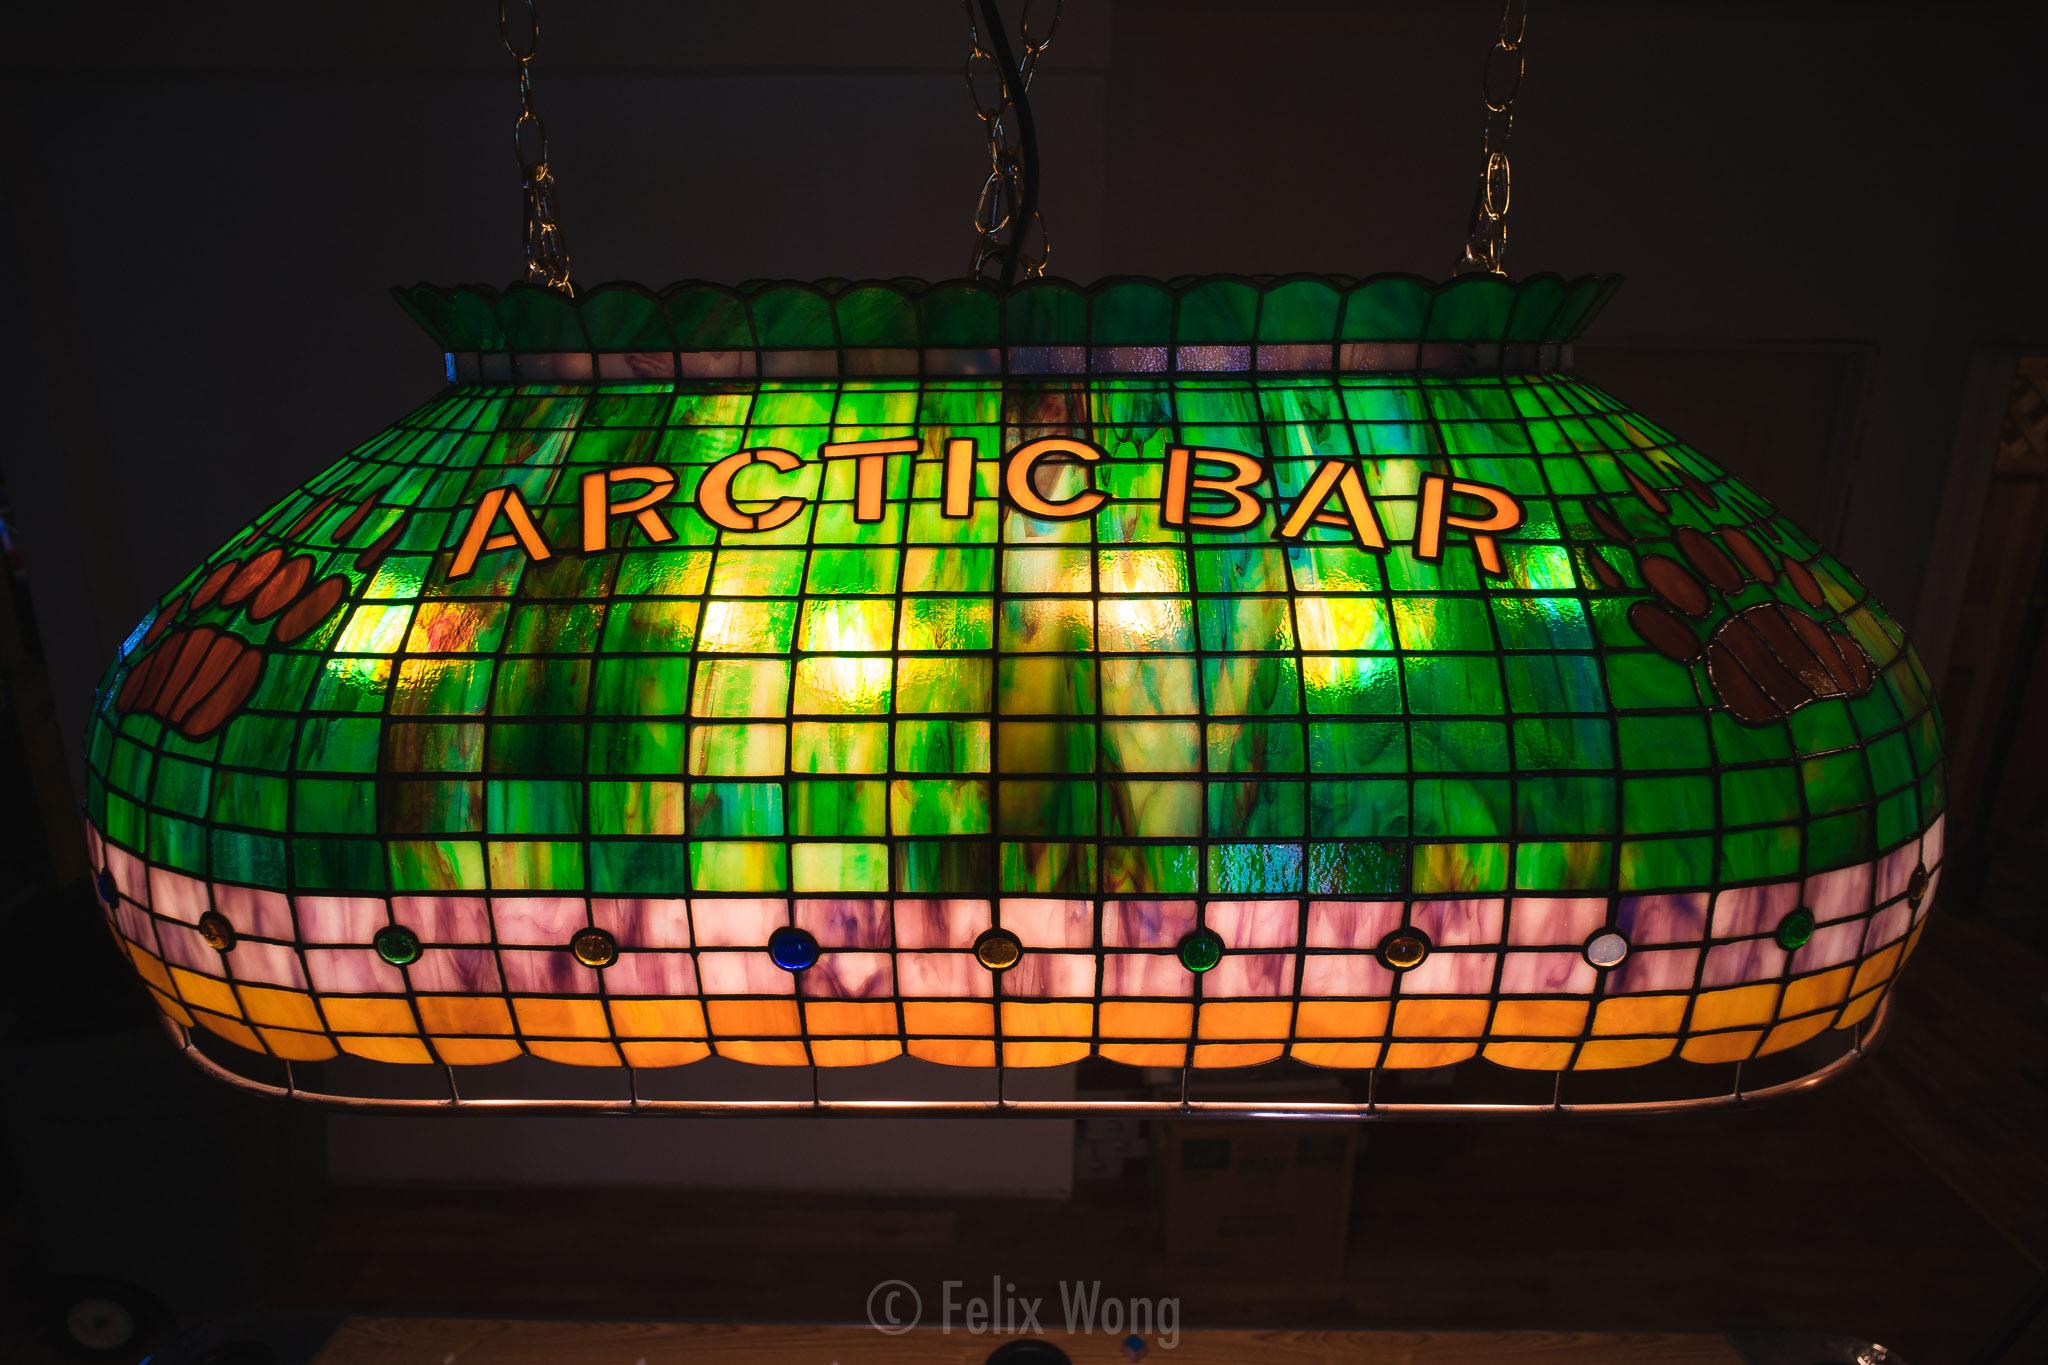 Alaska's World Famous Arctic Bar lamp by Terry Pyles